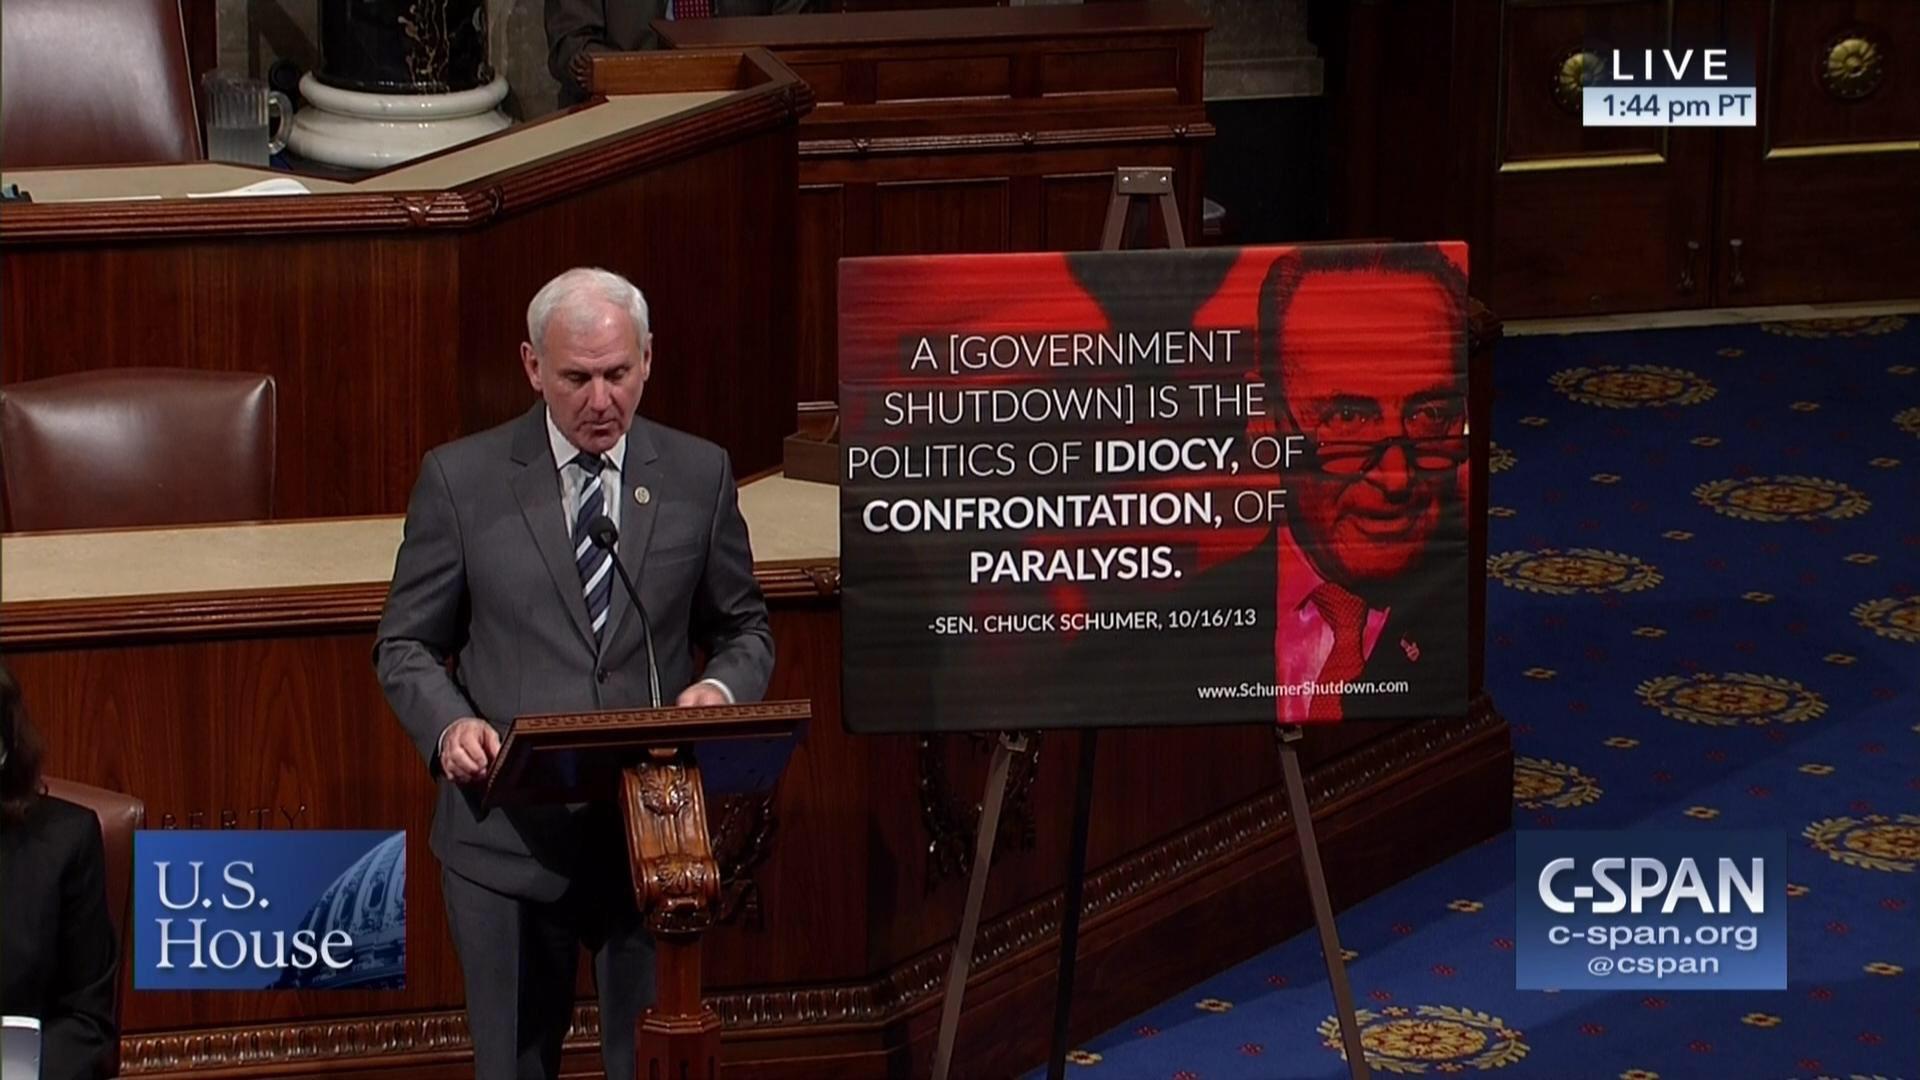 Dem forces vote on GOP lawmaker's poster slamming Schumer on House floor https://t.co/RUTL4xbEJq https://t.co/pZdEjEXeyc